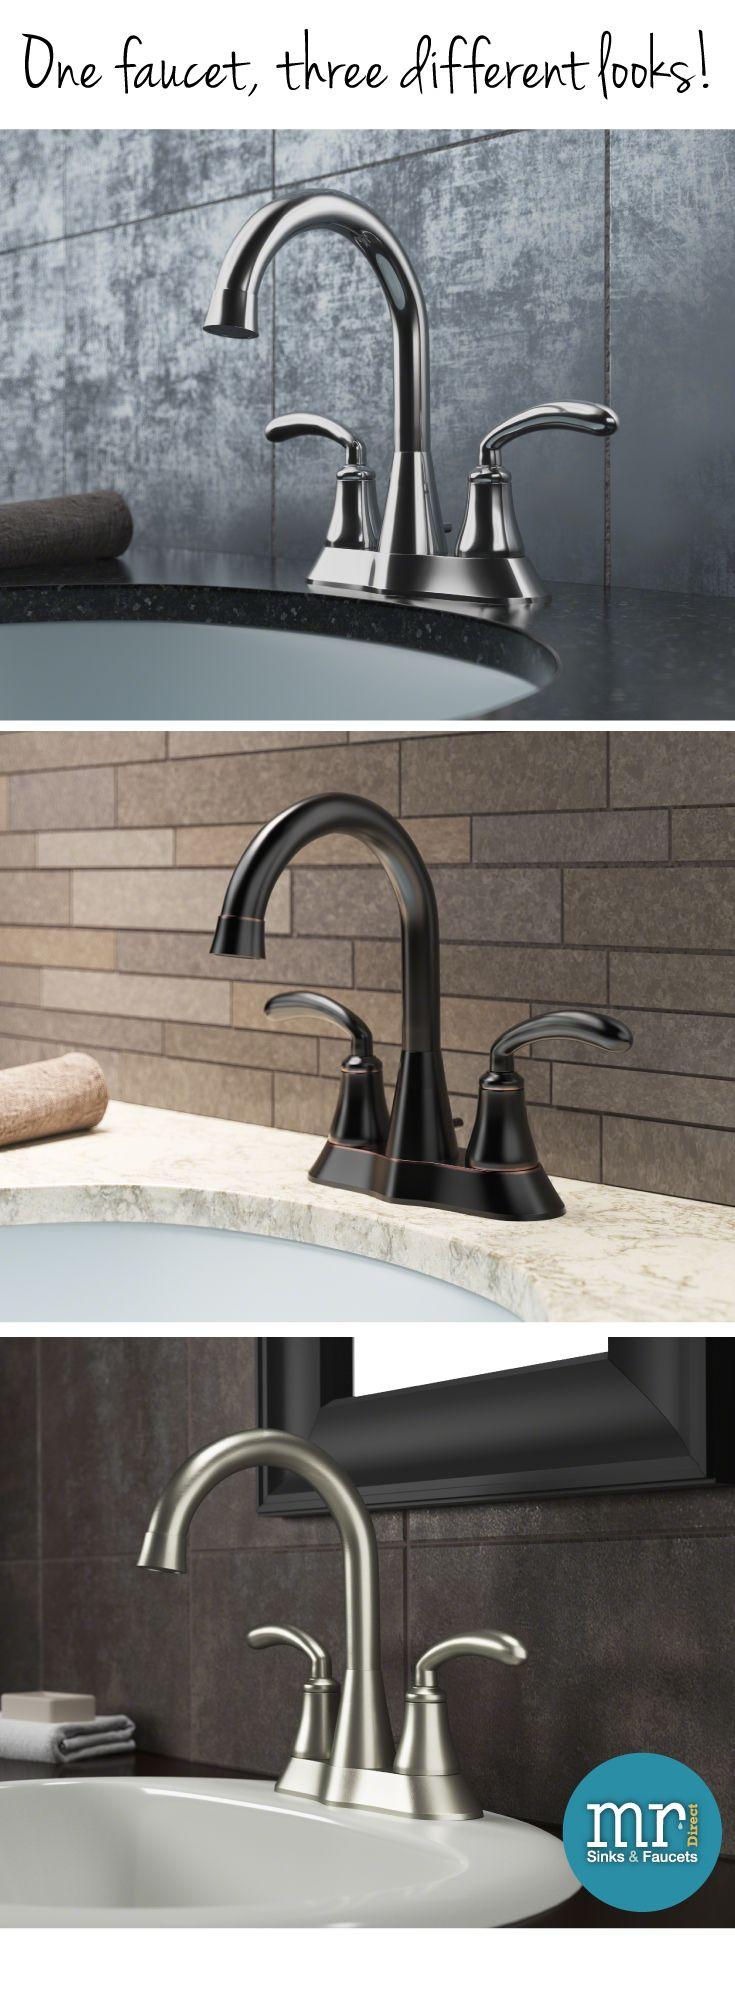 150 best bathroom sinks & faucets images on pinterest | bathroom